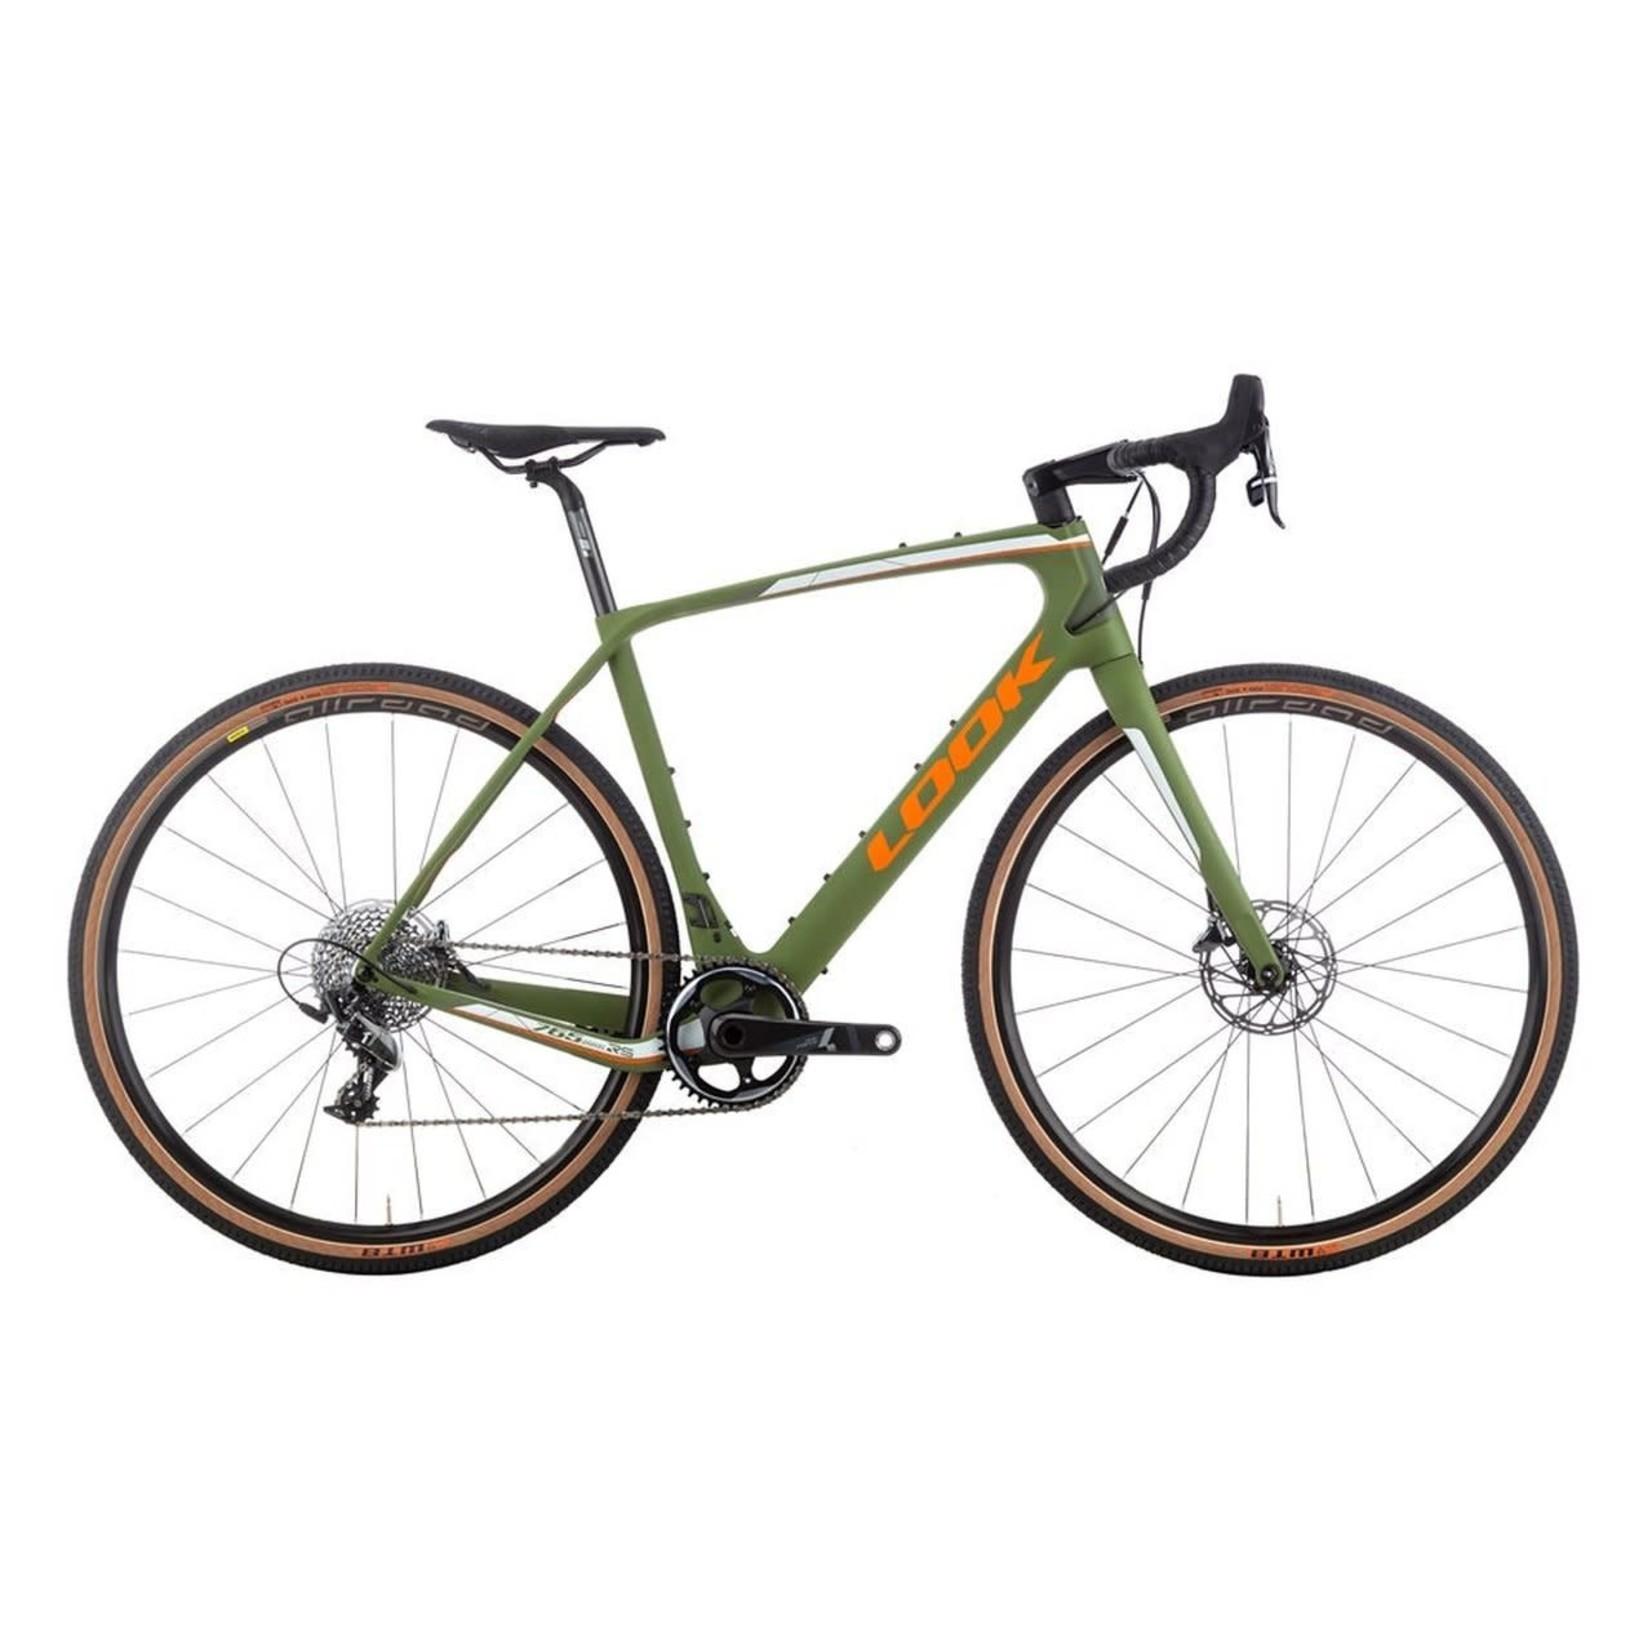 Look LOOK 765 Gravel RS Force 1X Bike XS